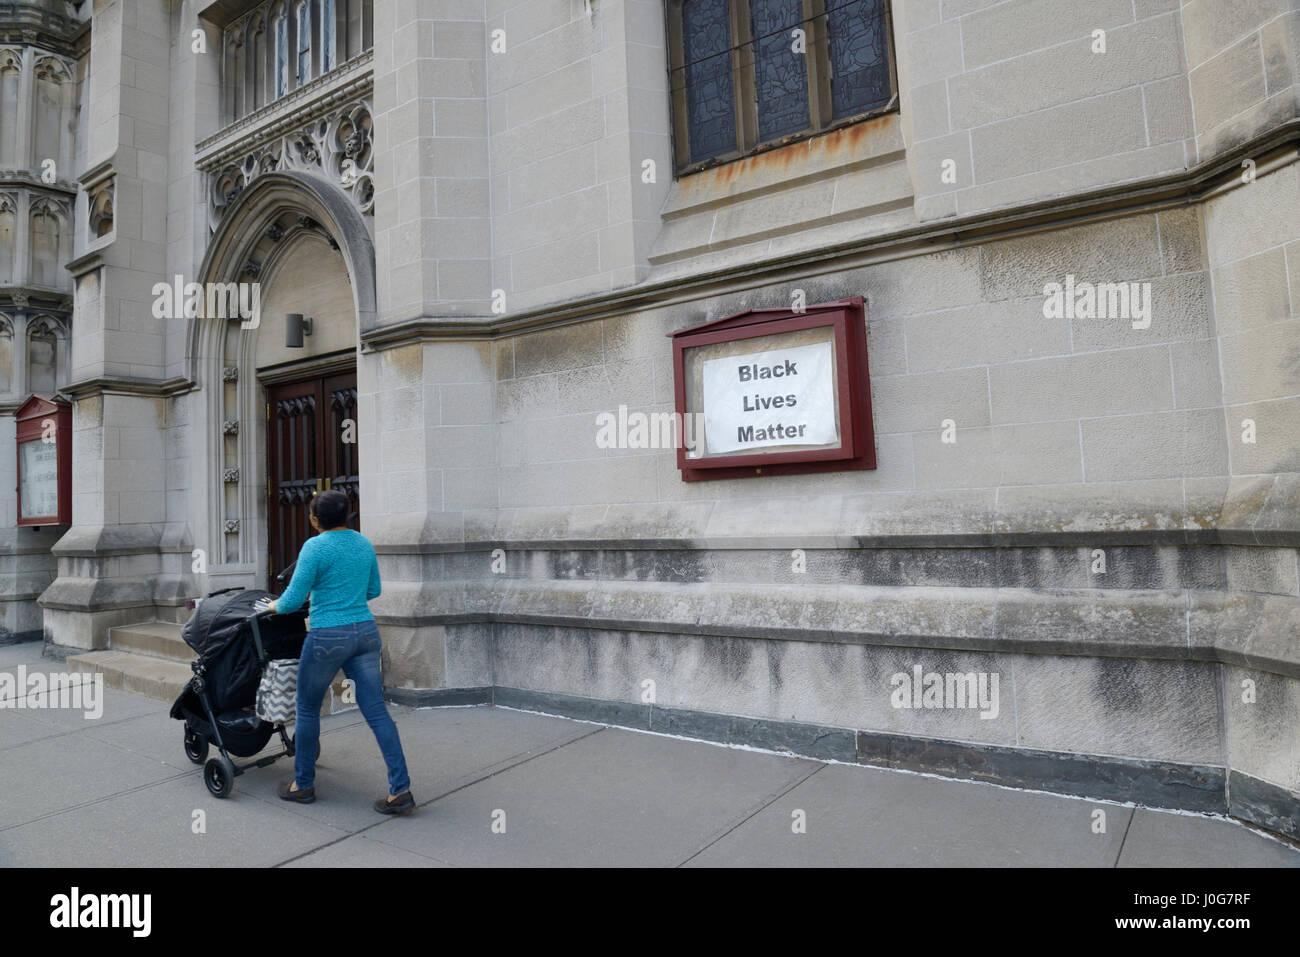 Black Lives Matter slogan sign on a Unitarian Universalist church, NYC - Stock Image